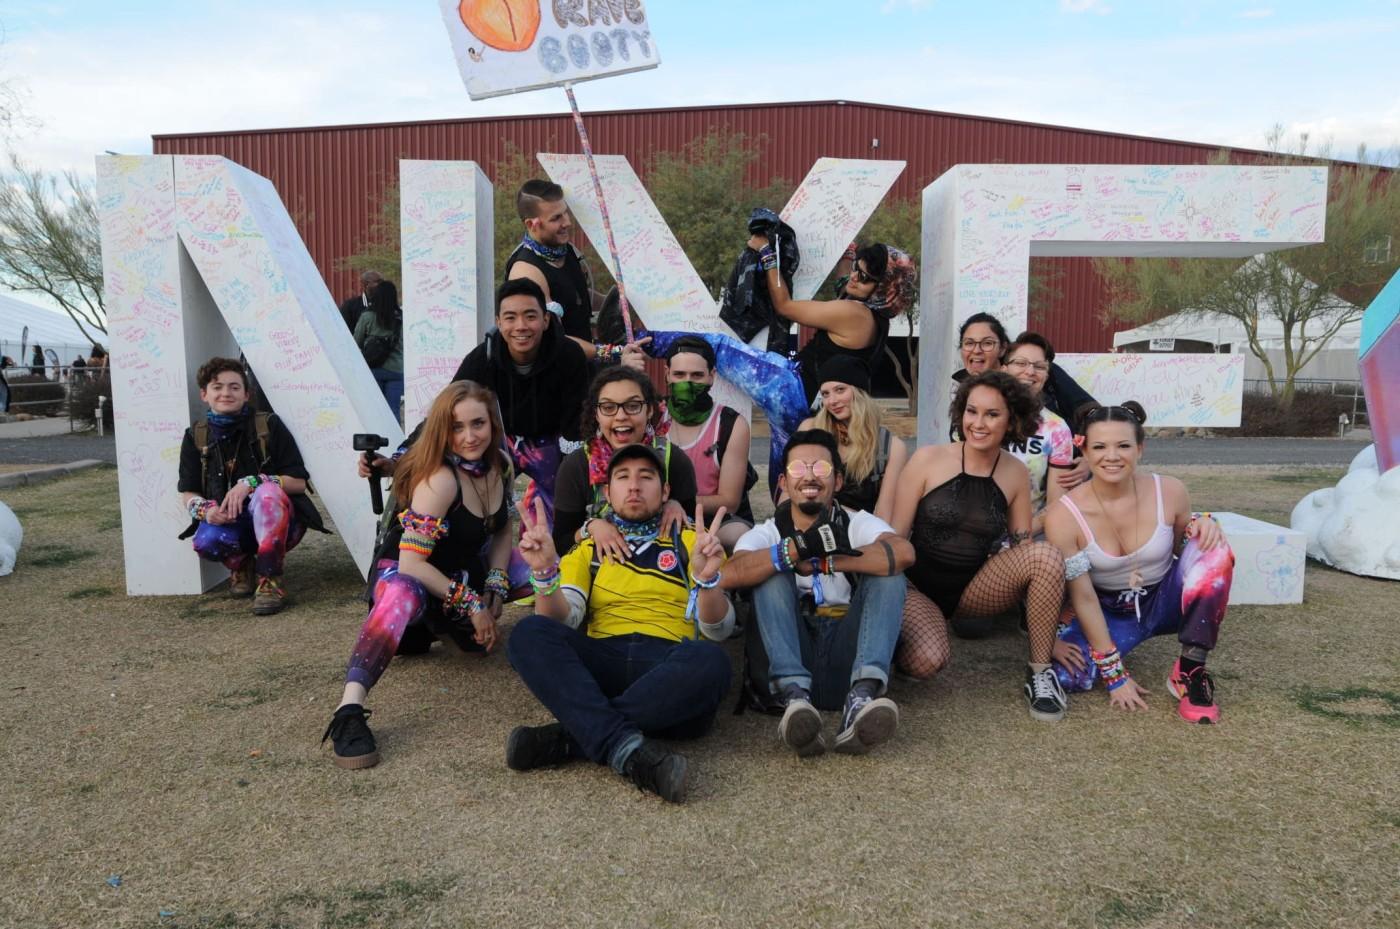 Deca AZ - People 3 (Phoenix New Times)